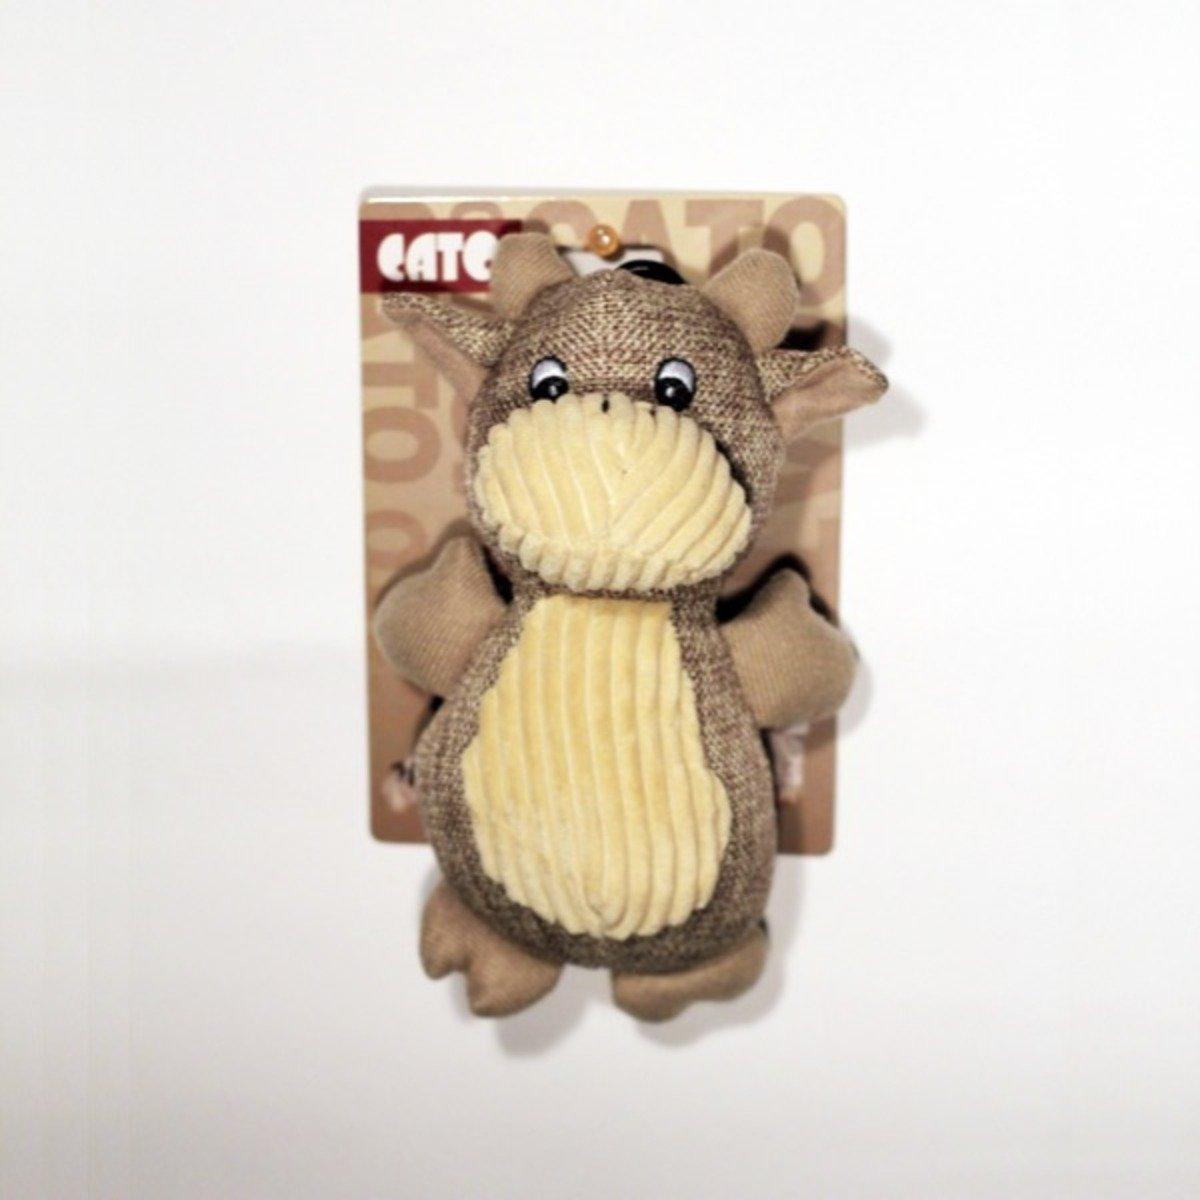 Love Pet 牛咇咇玩具